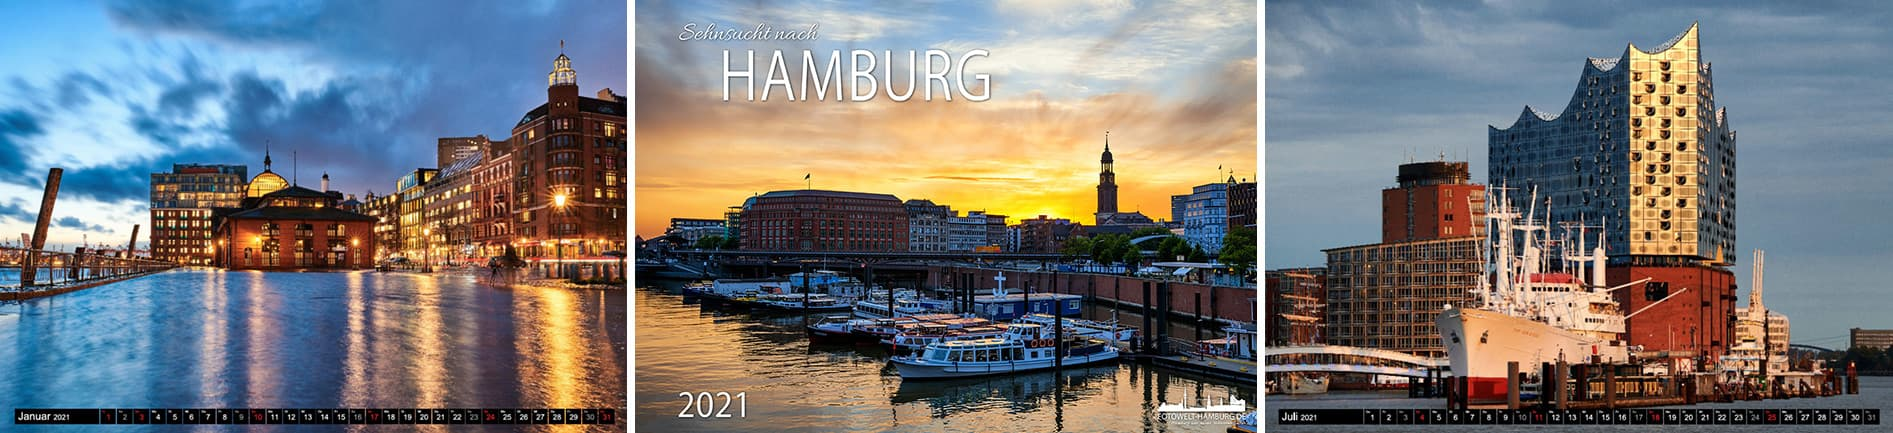 Hamburg Kalender 2021 - Hamburg Wandkalender online bestellen